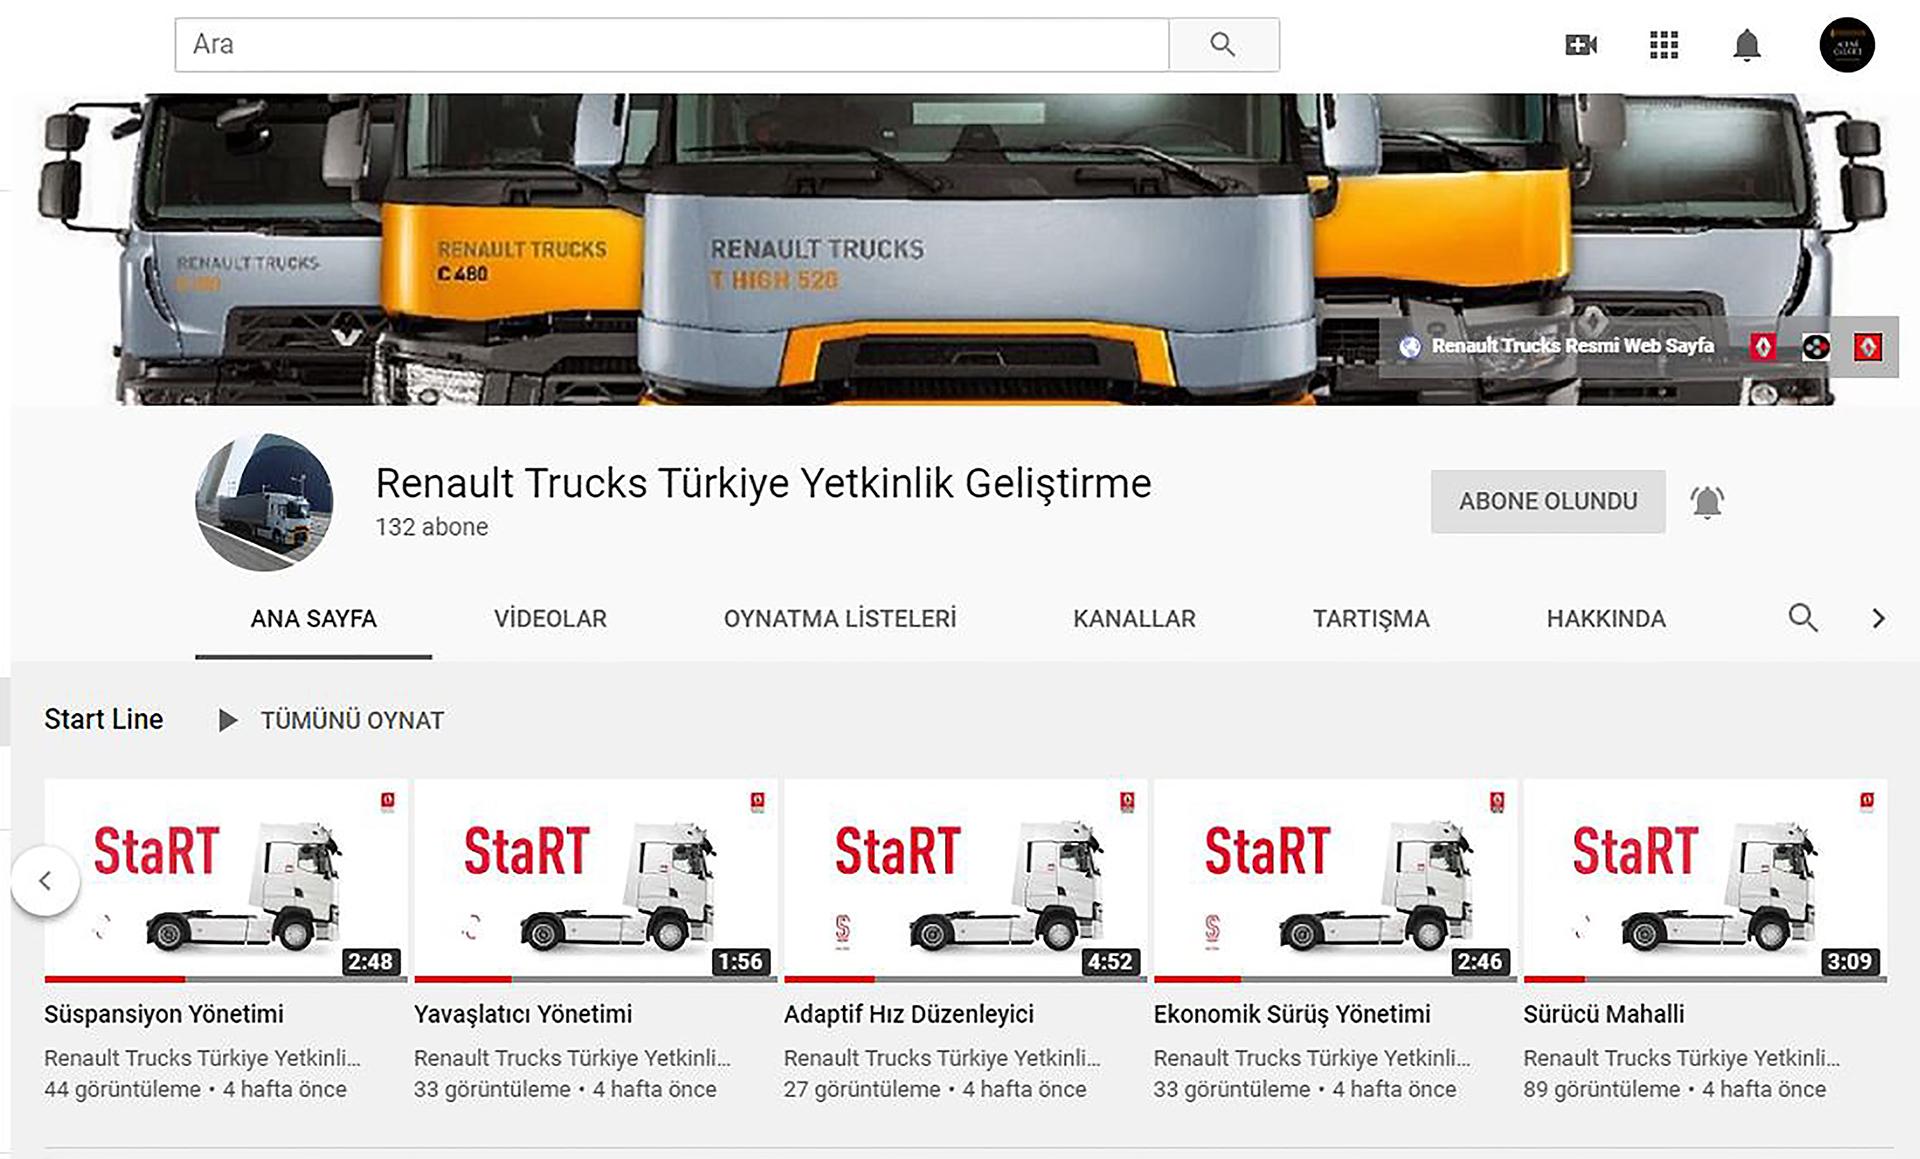 renault_trucks_akademi_sanal_s__n__f_uygulamasi.jpg